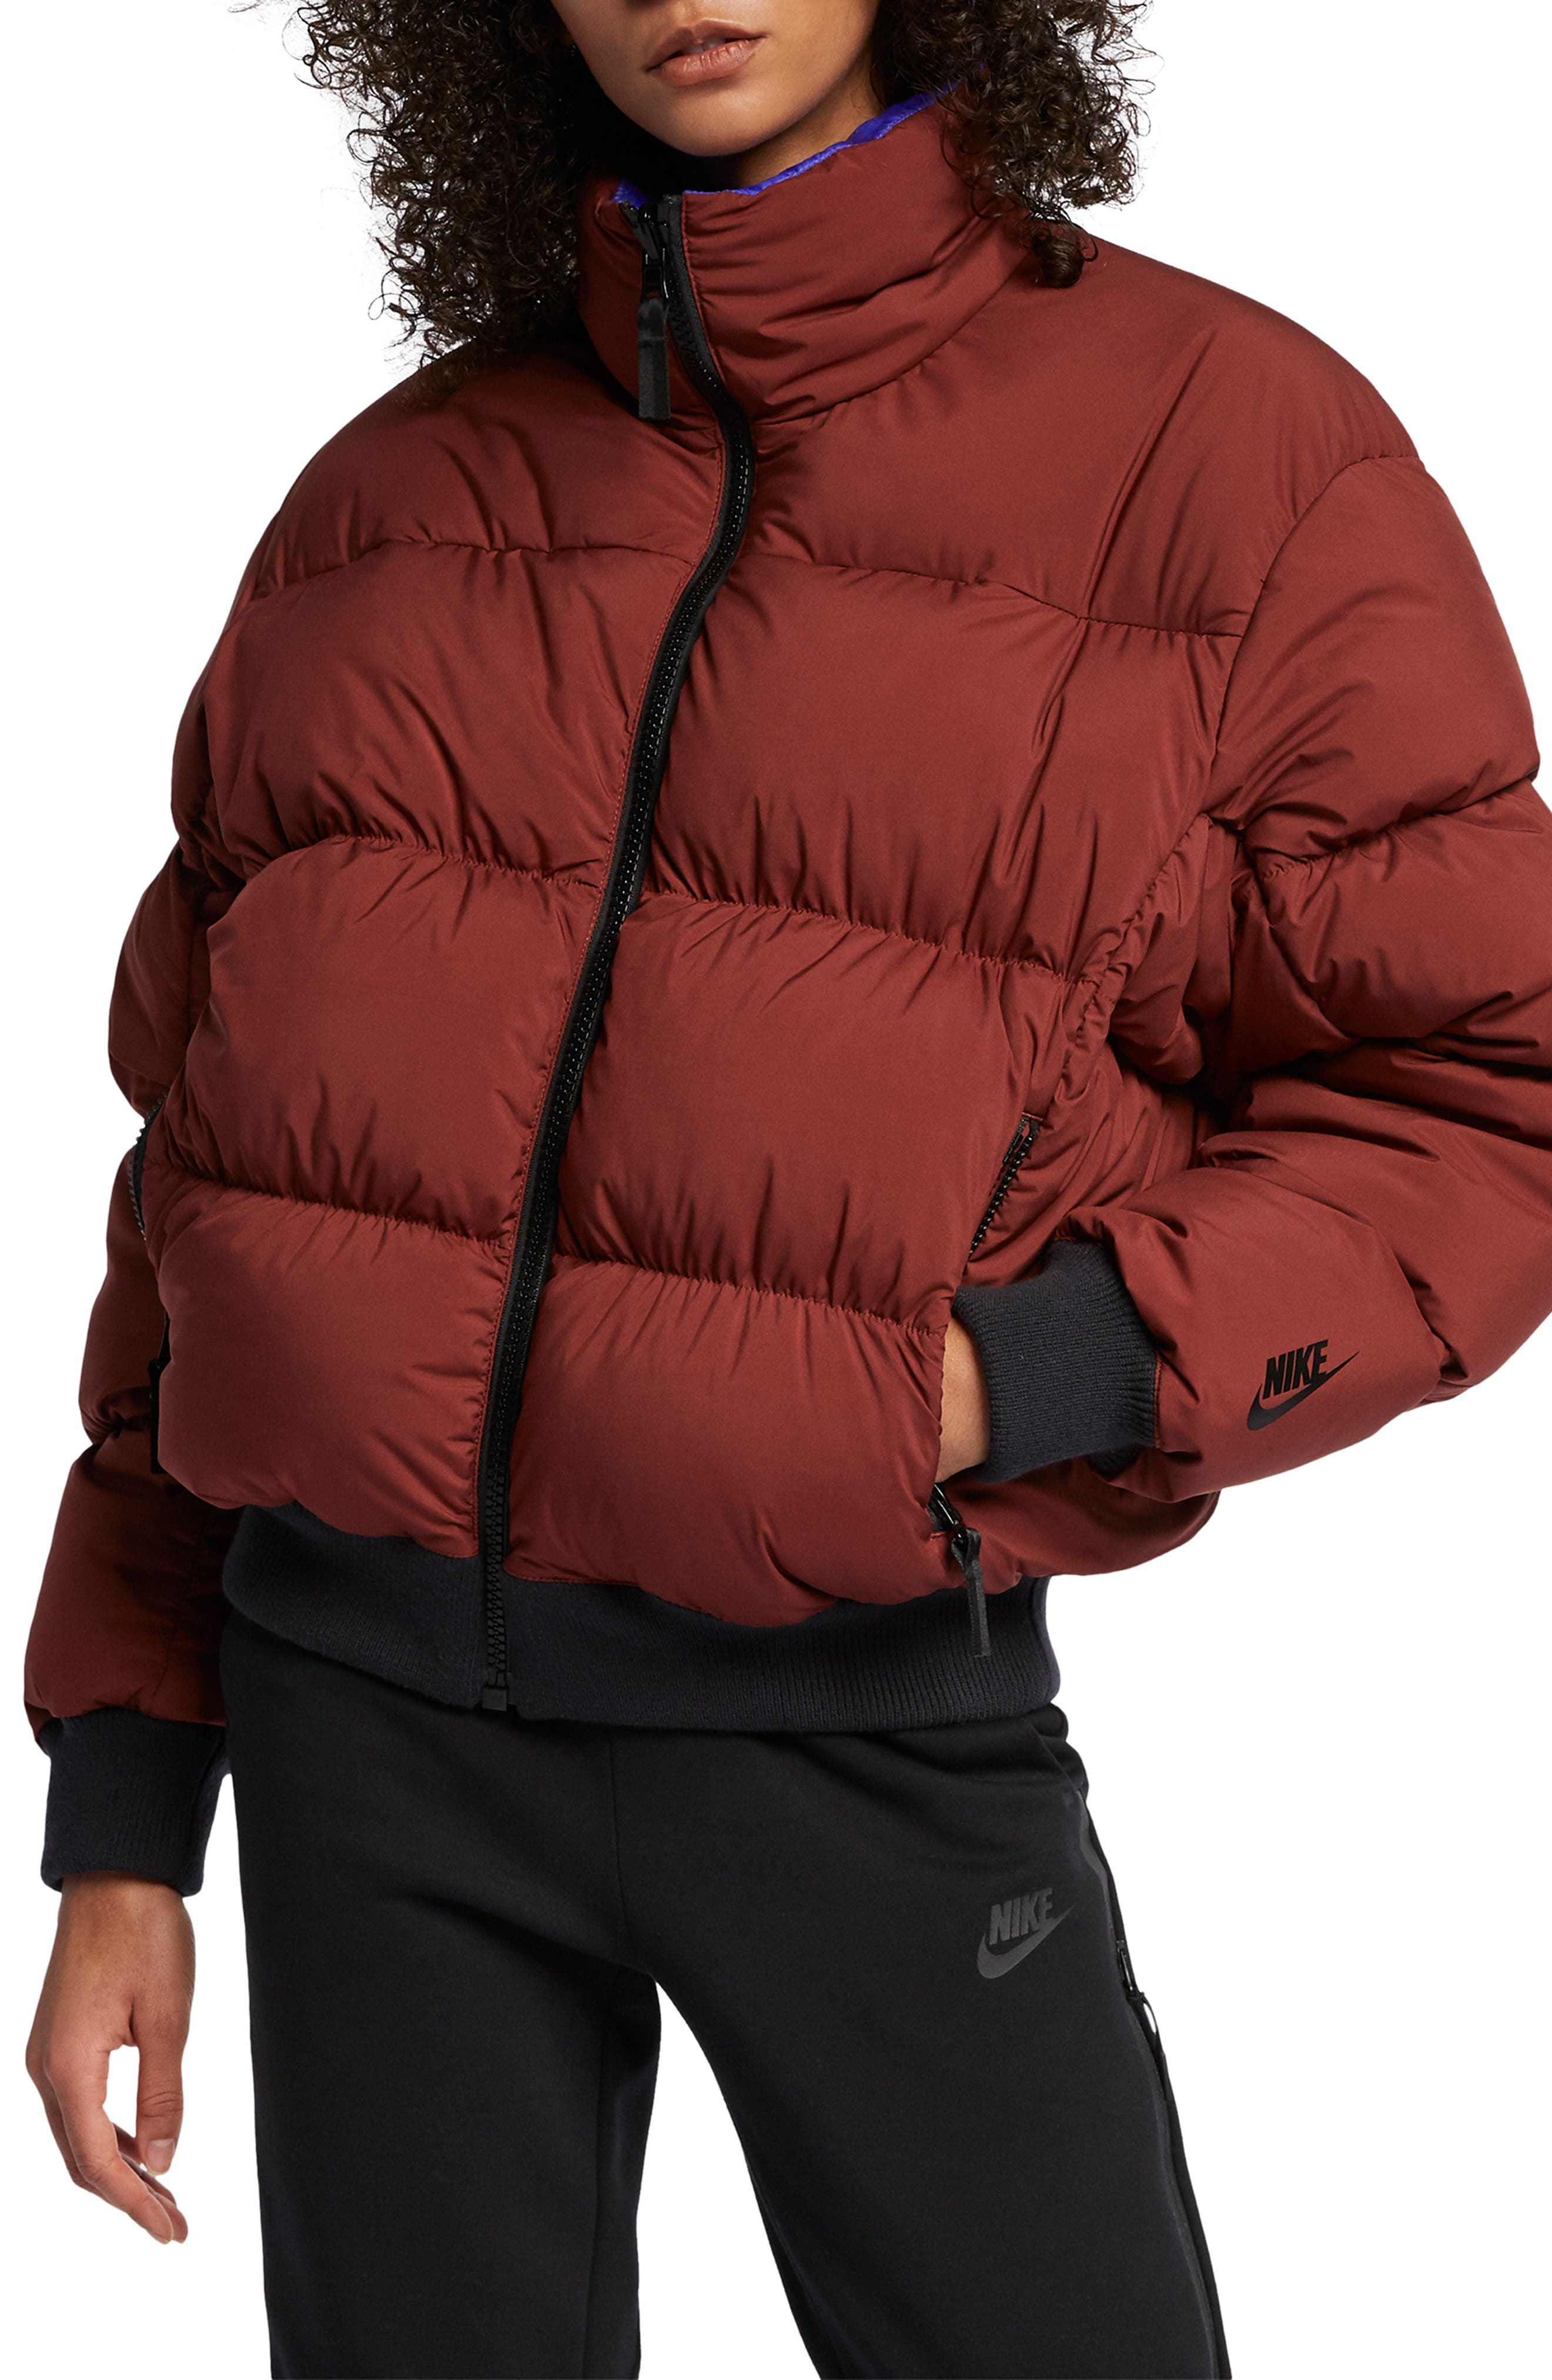 Nike Nrg Reversible Down Fill Puffer Jacket, Beige